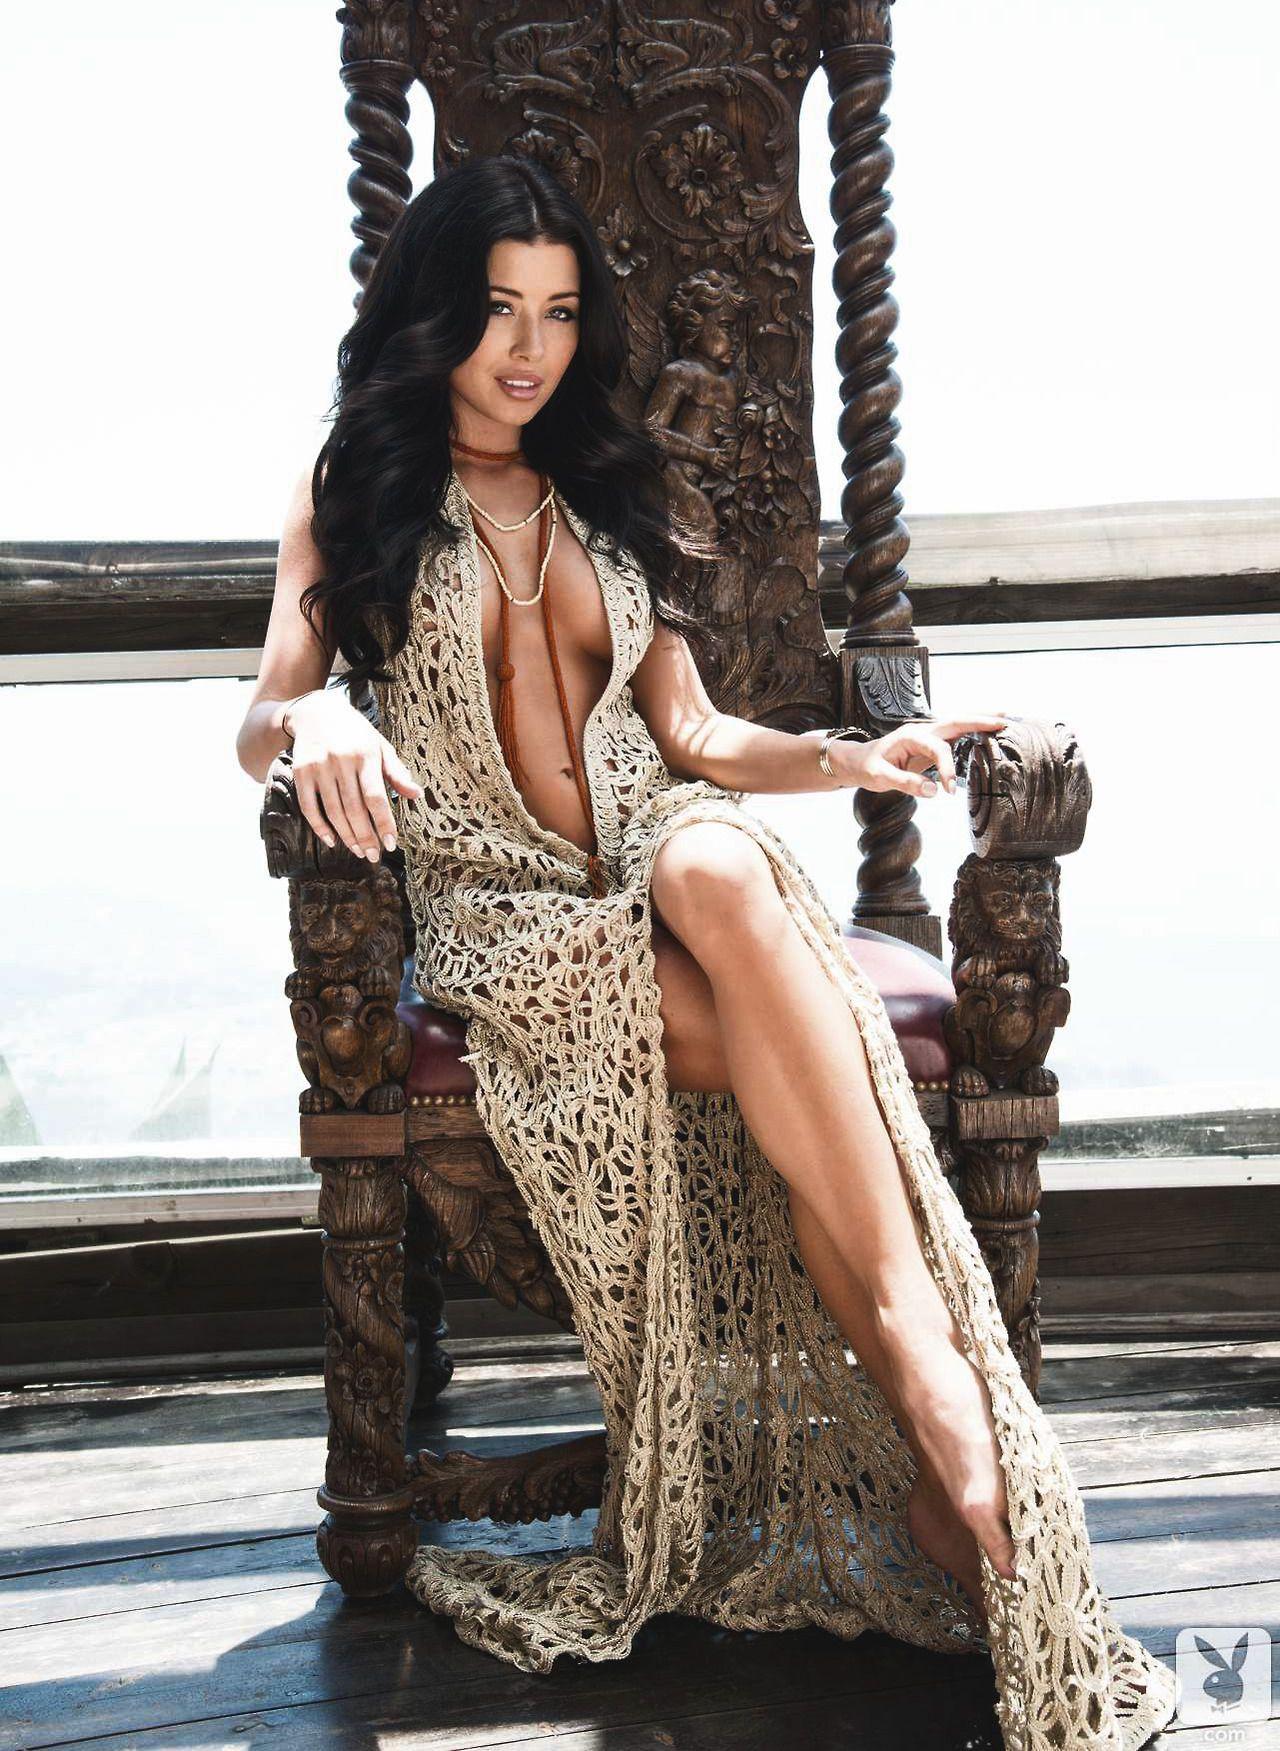 Hot Masika Tucker nude (47 photos), Pussy, Hot, Feet, cleavage 2015